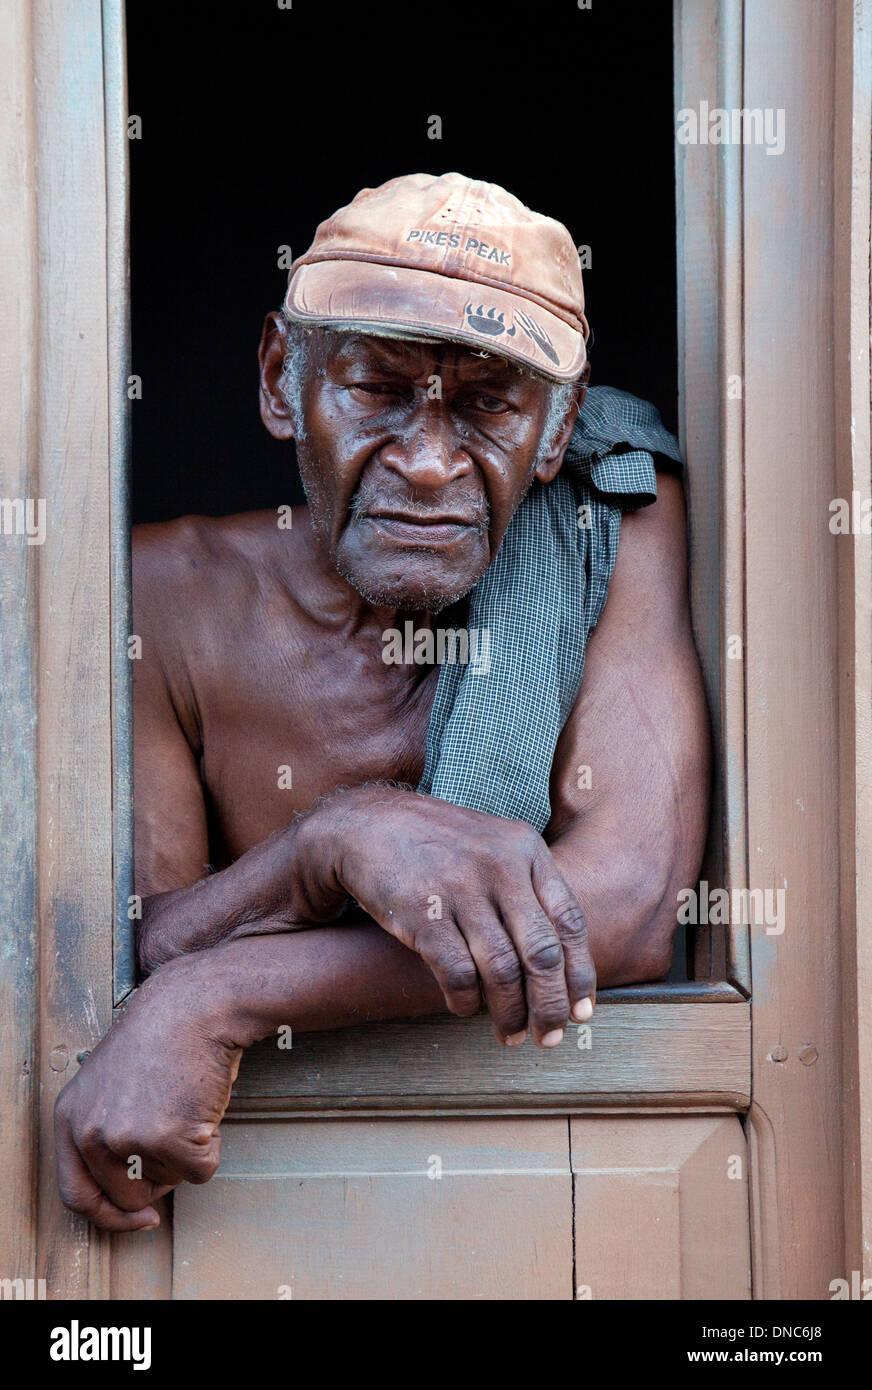 cuban-man-head-and-shoulders-portrait-trinidad-cuba-caribbean-latin-DNC6J8.jpg